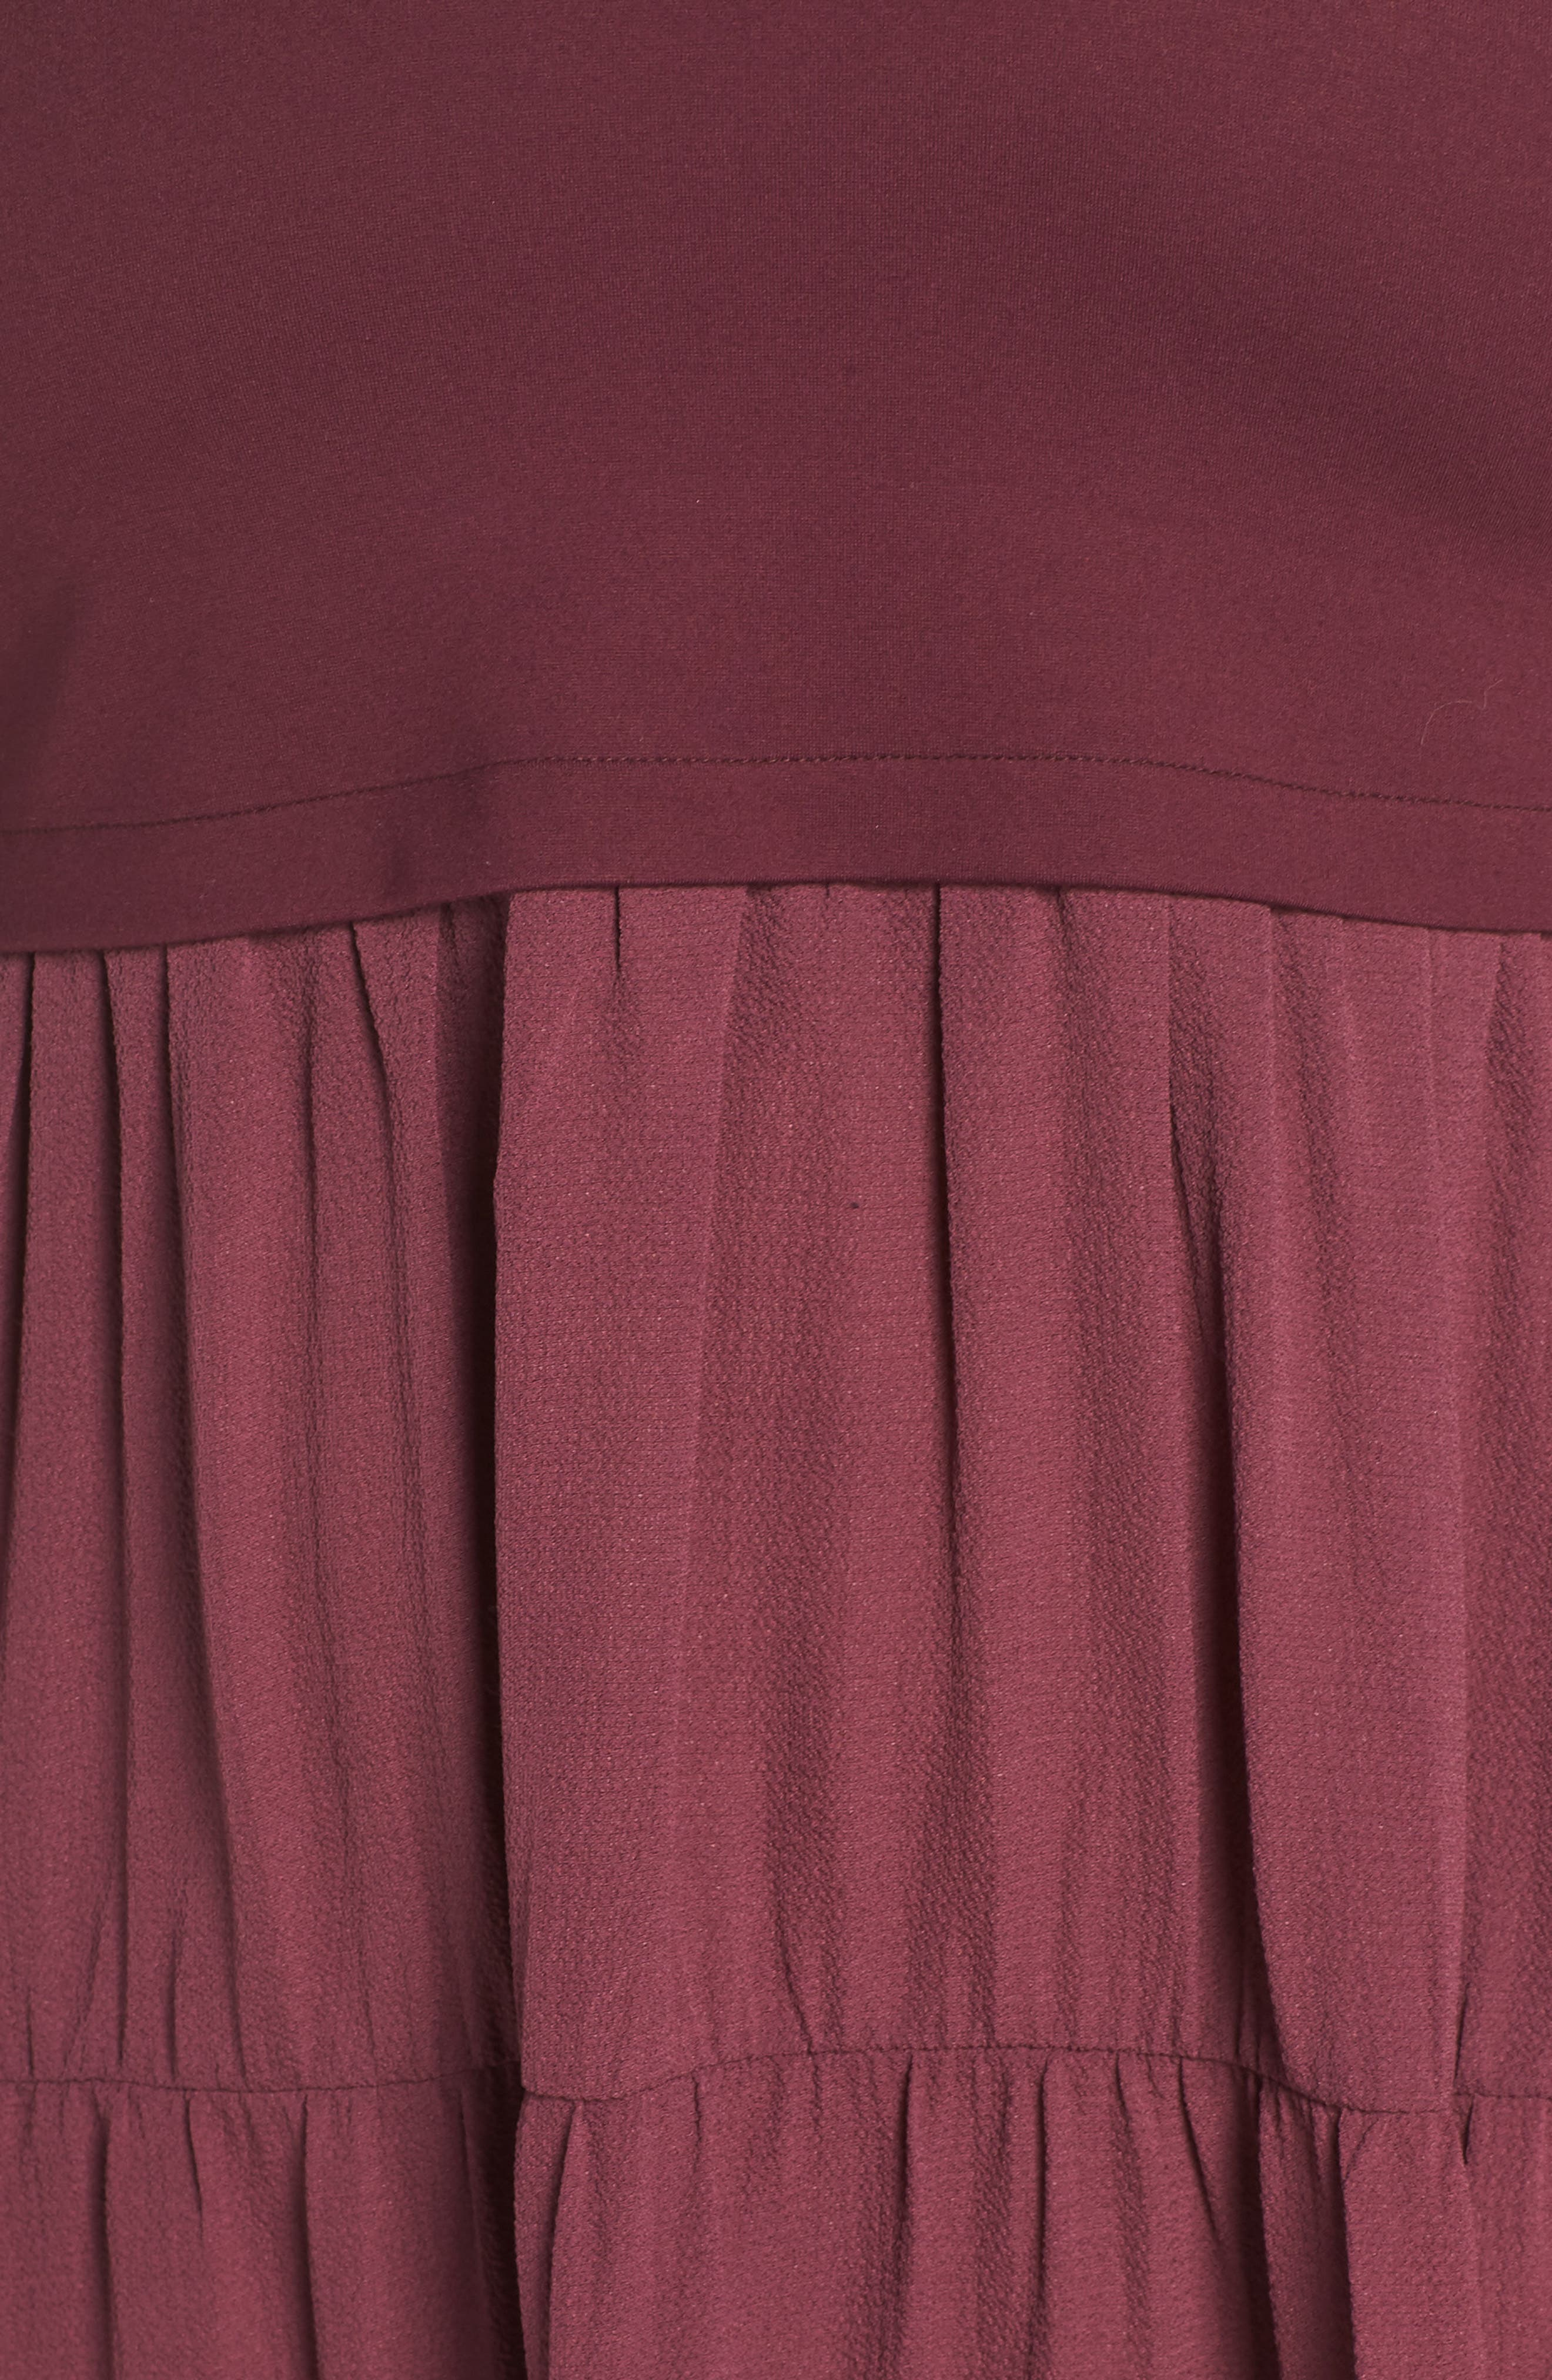 Mixed Media Ruffle Detail Swing Dress,                             Alternate thumbnail 6, color,                             BURGUNDY